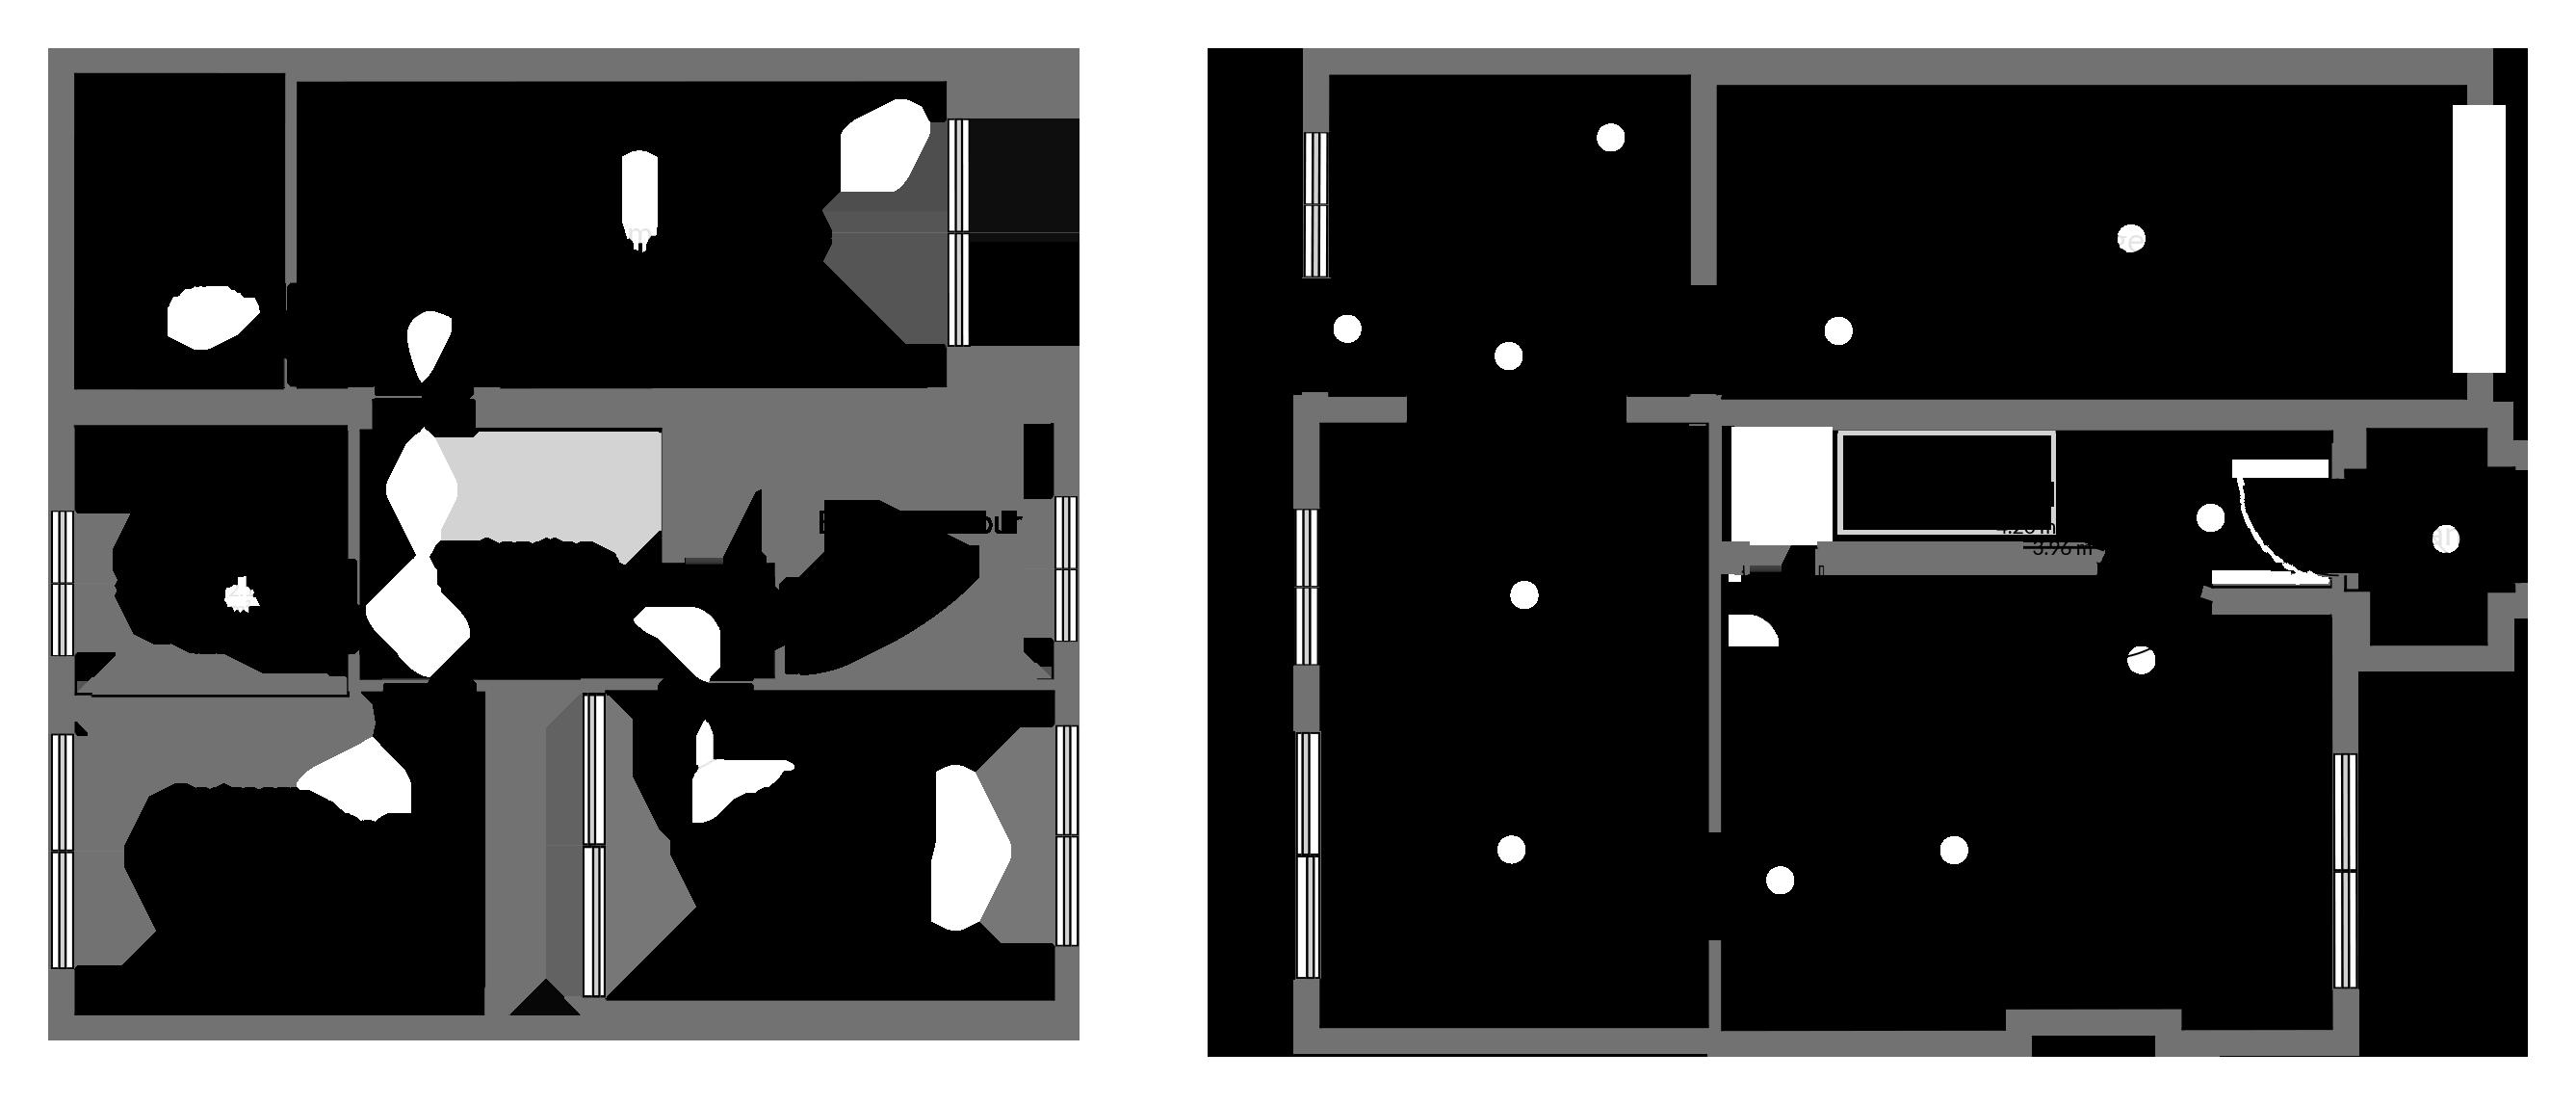 Floorplan for Slimbridge Close, Yate.